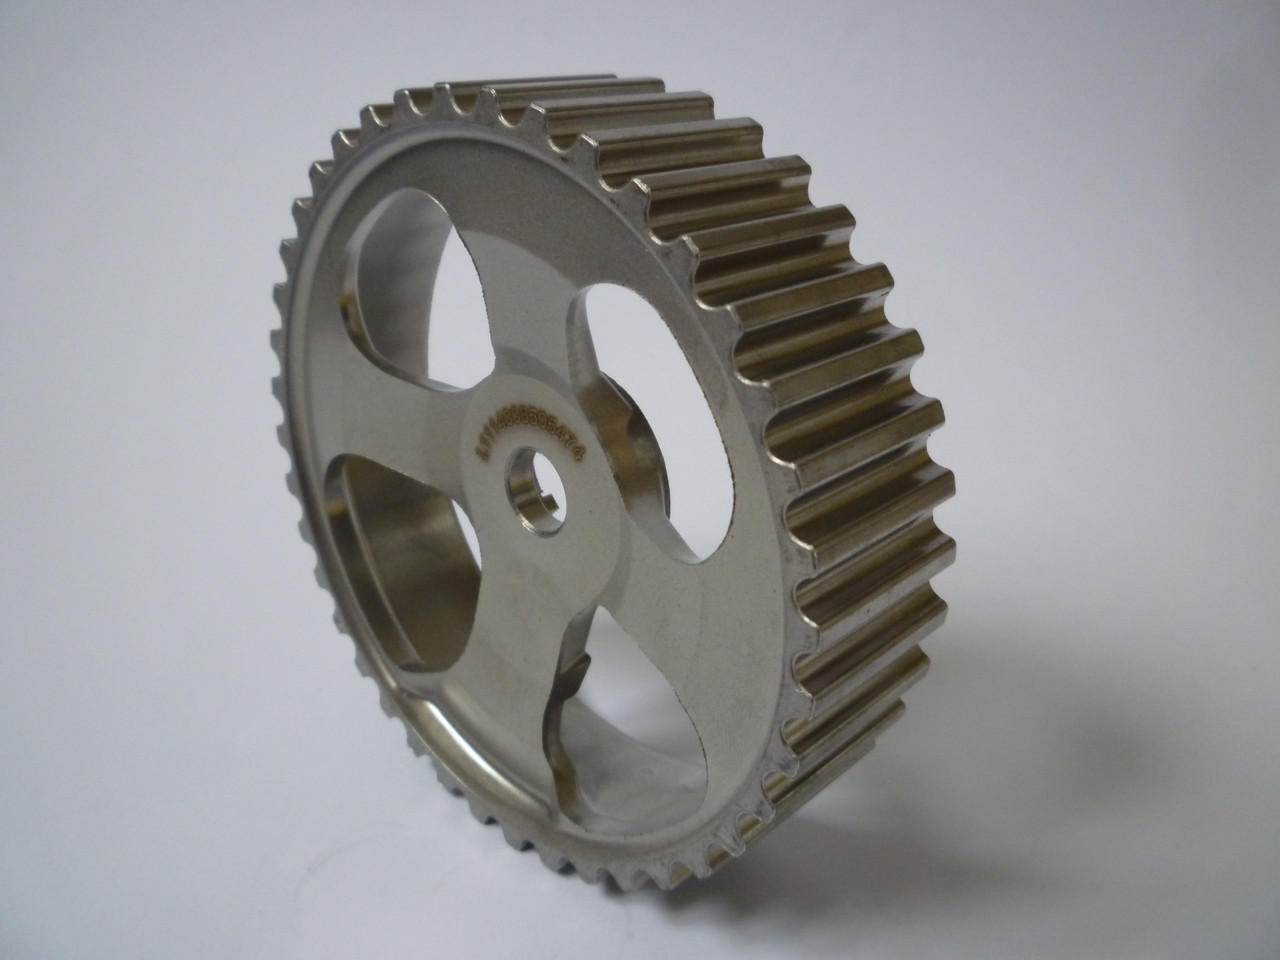 Шкив, шестерня распредвала на Renault Trafic / Opel Vivaro 1.9dCi с 2001... Metalcaucho (Испания), MC05474